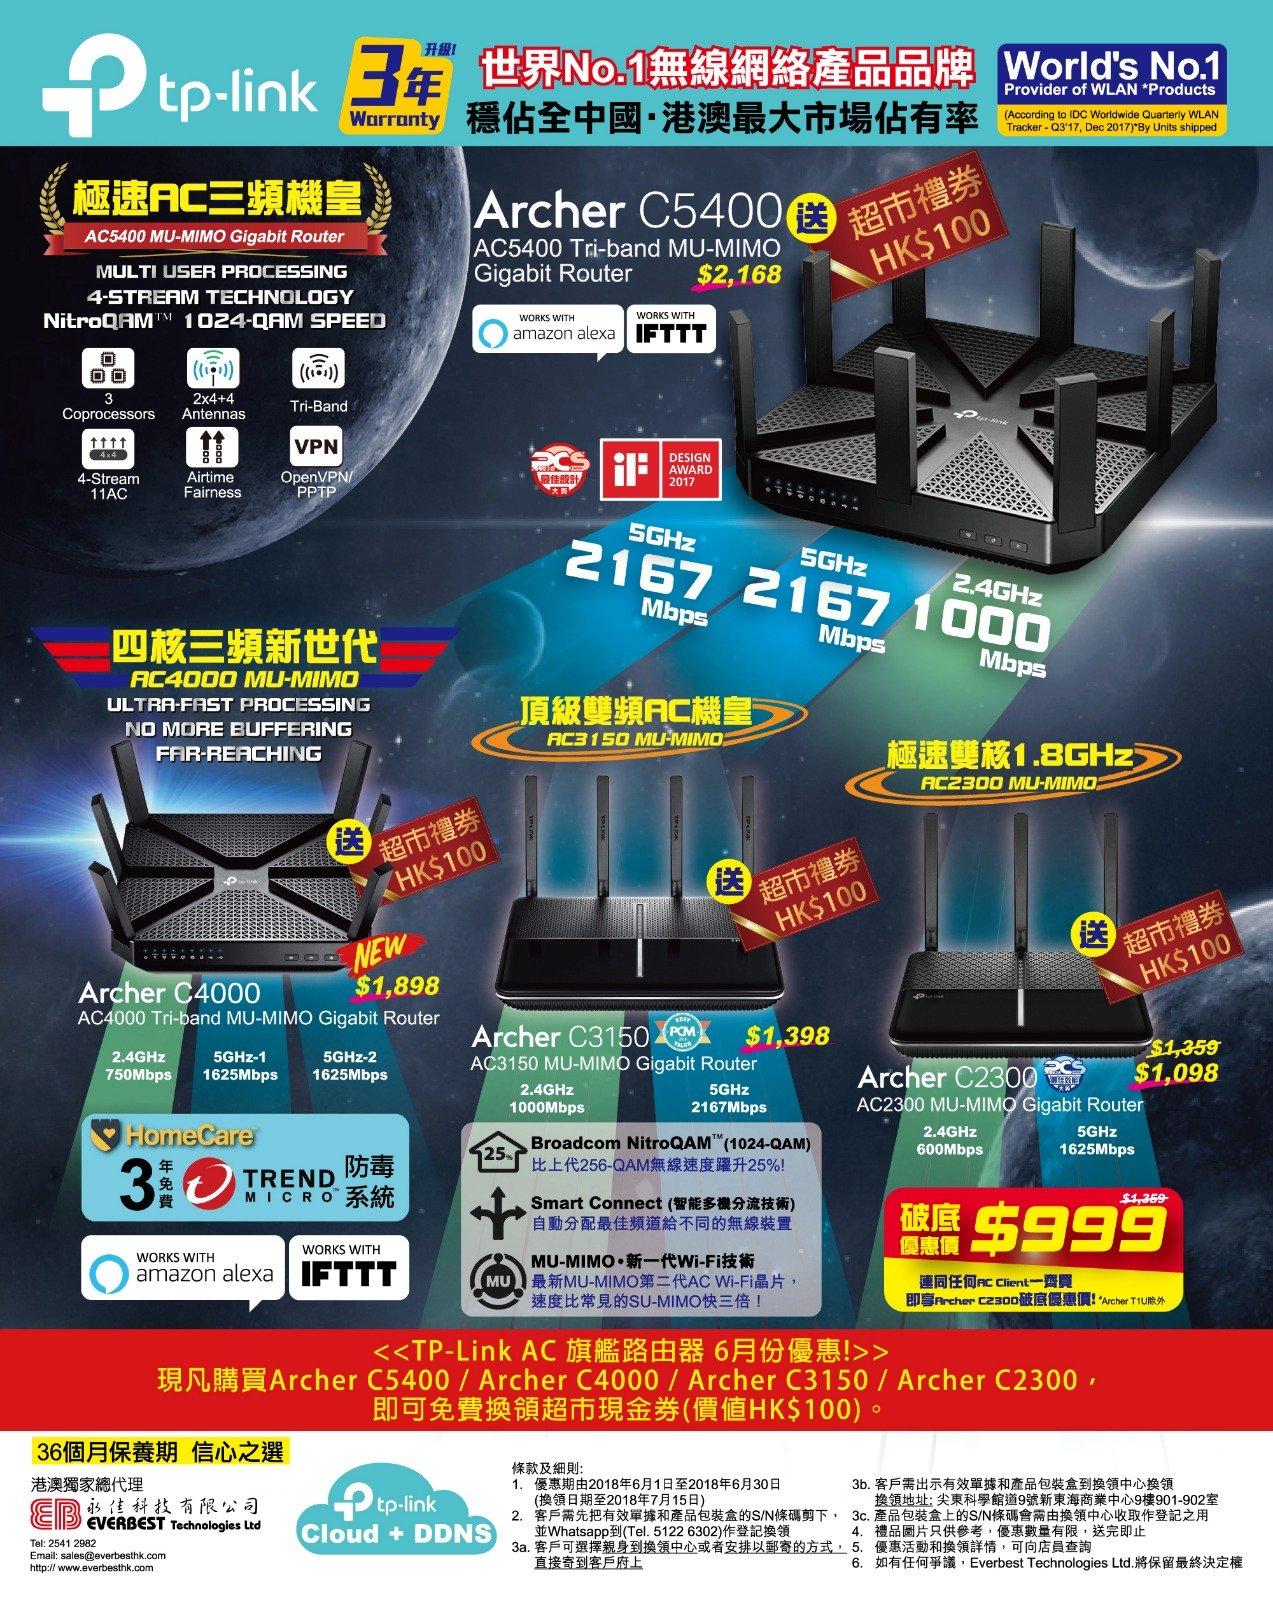 TP-LINK | AC2300 MU-MIMO 雙頻無線路由器Archer C2300 | HKTVmall